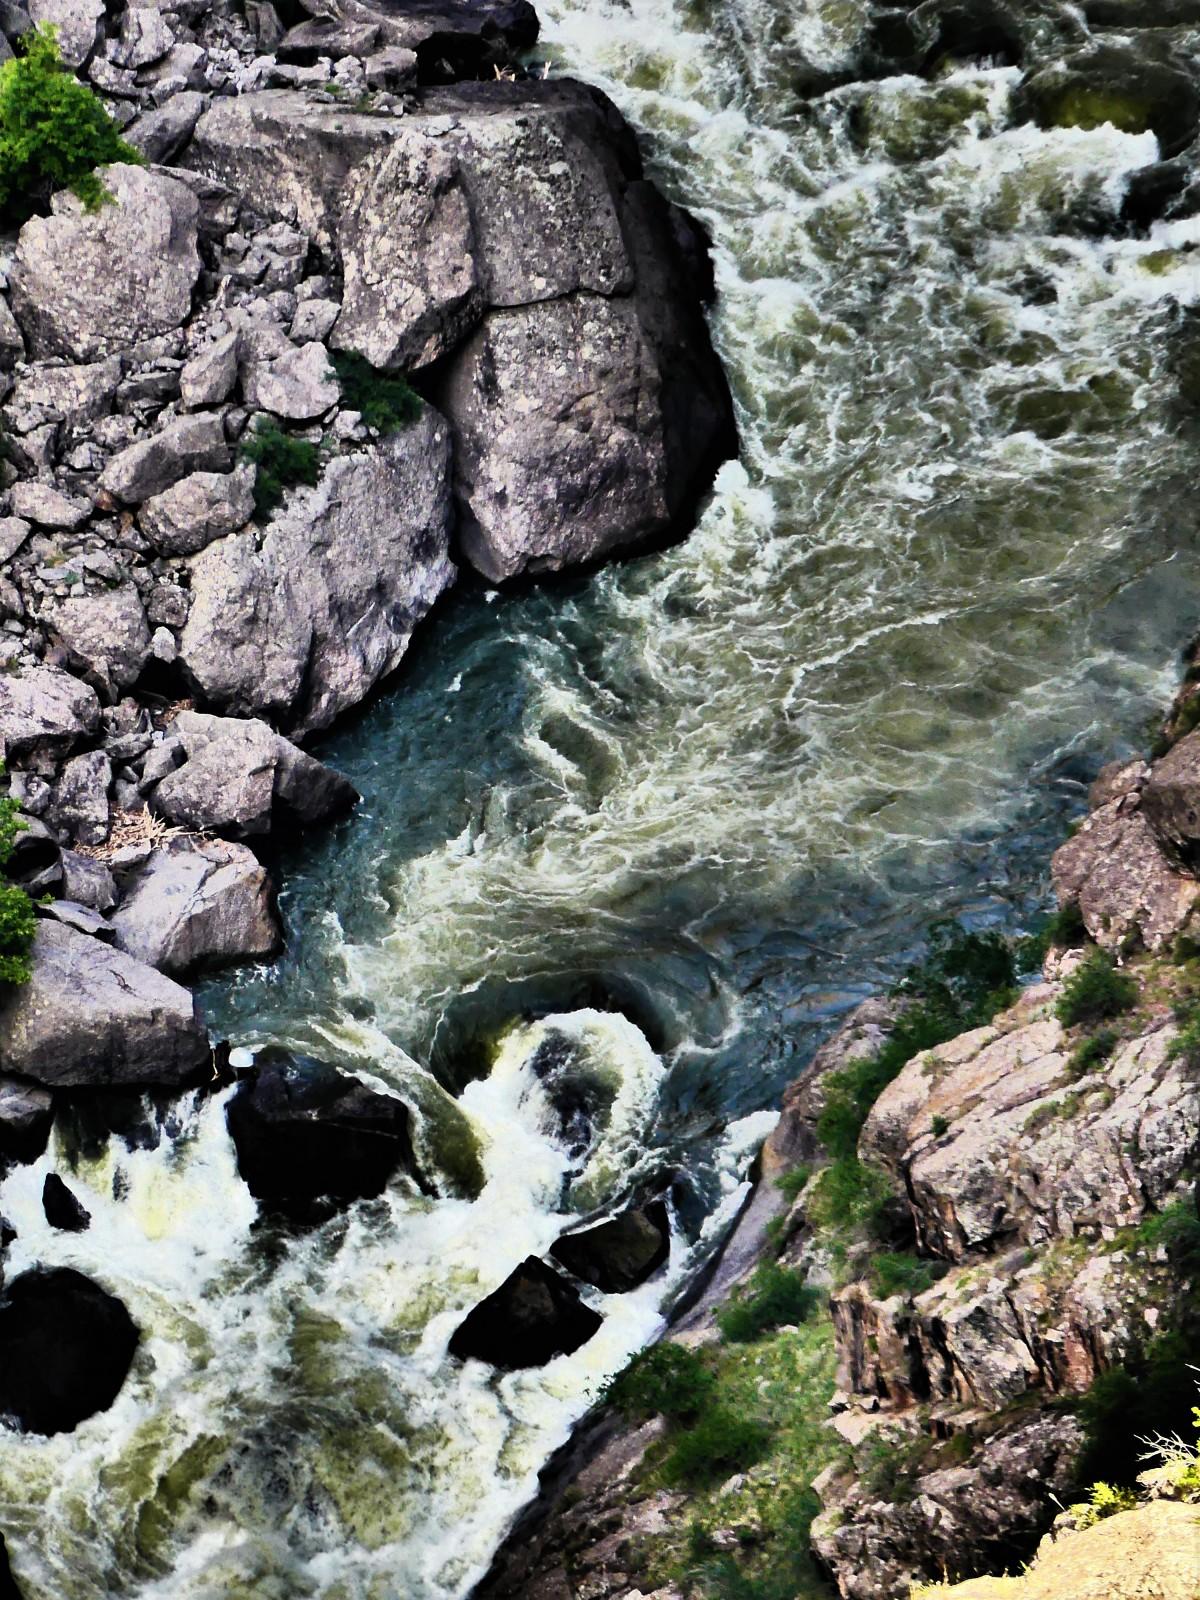 CU Gunnison rapids